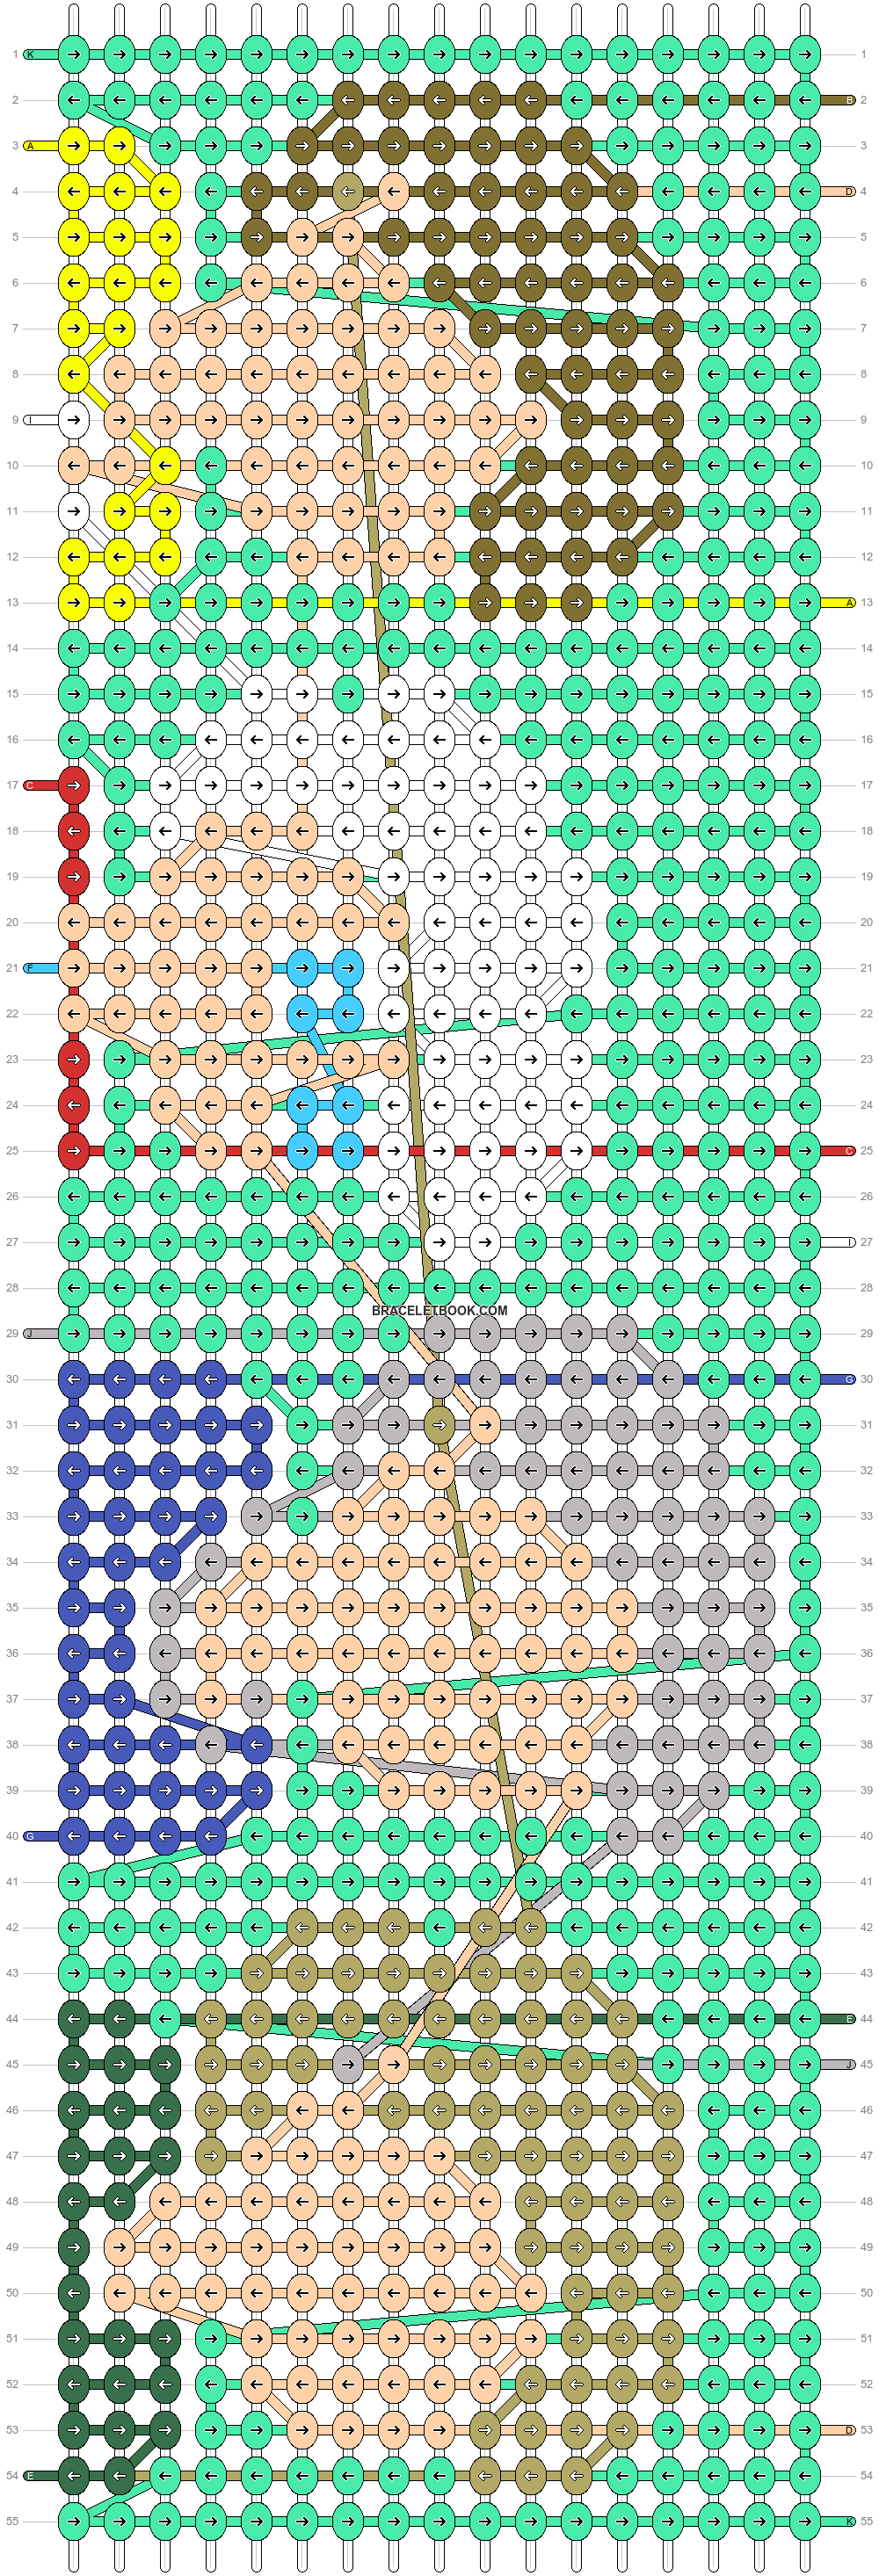 Alpha pattern #32486 pattern